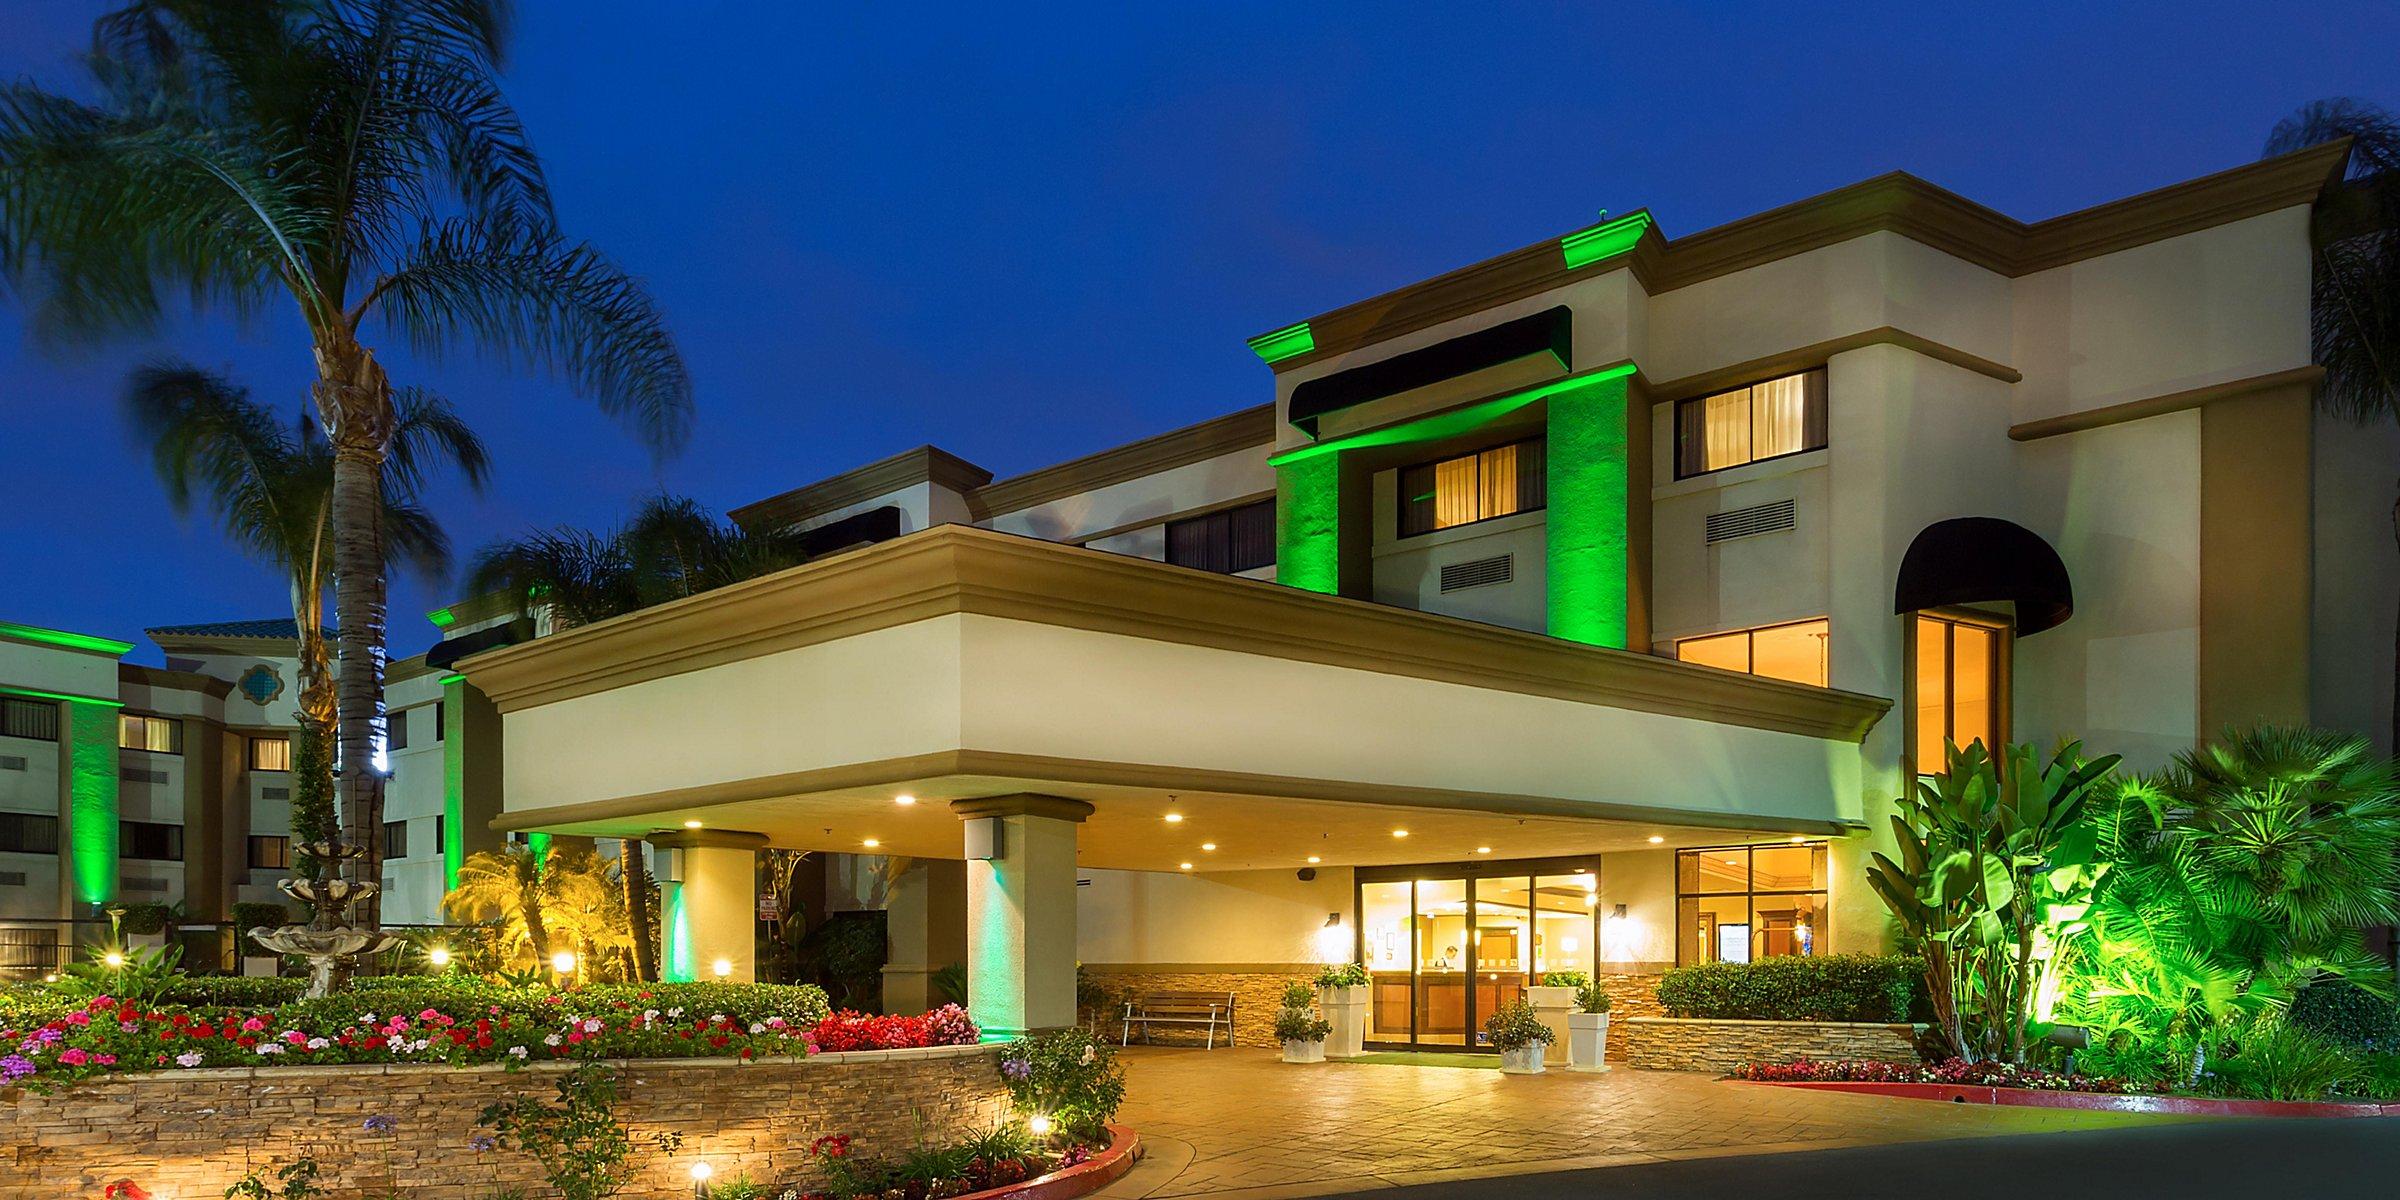 Hotels near John Wayne Airport (SNA) | Holiday Inn Santa Ana